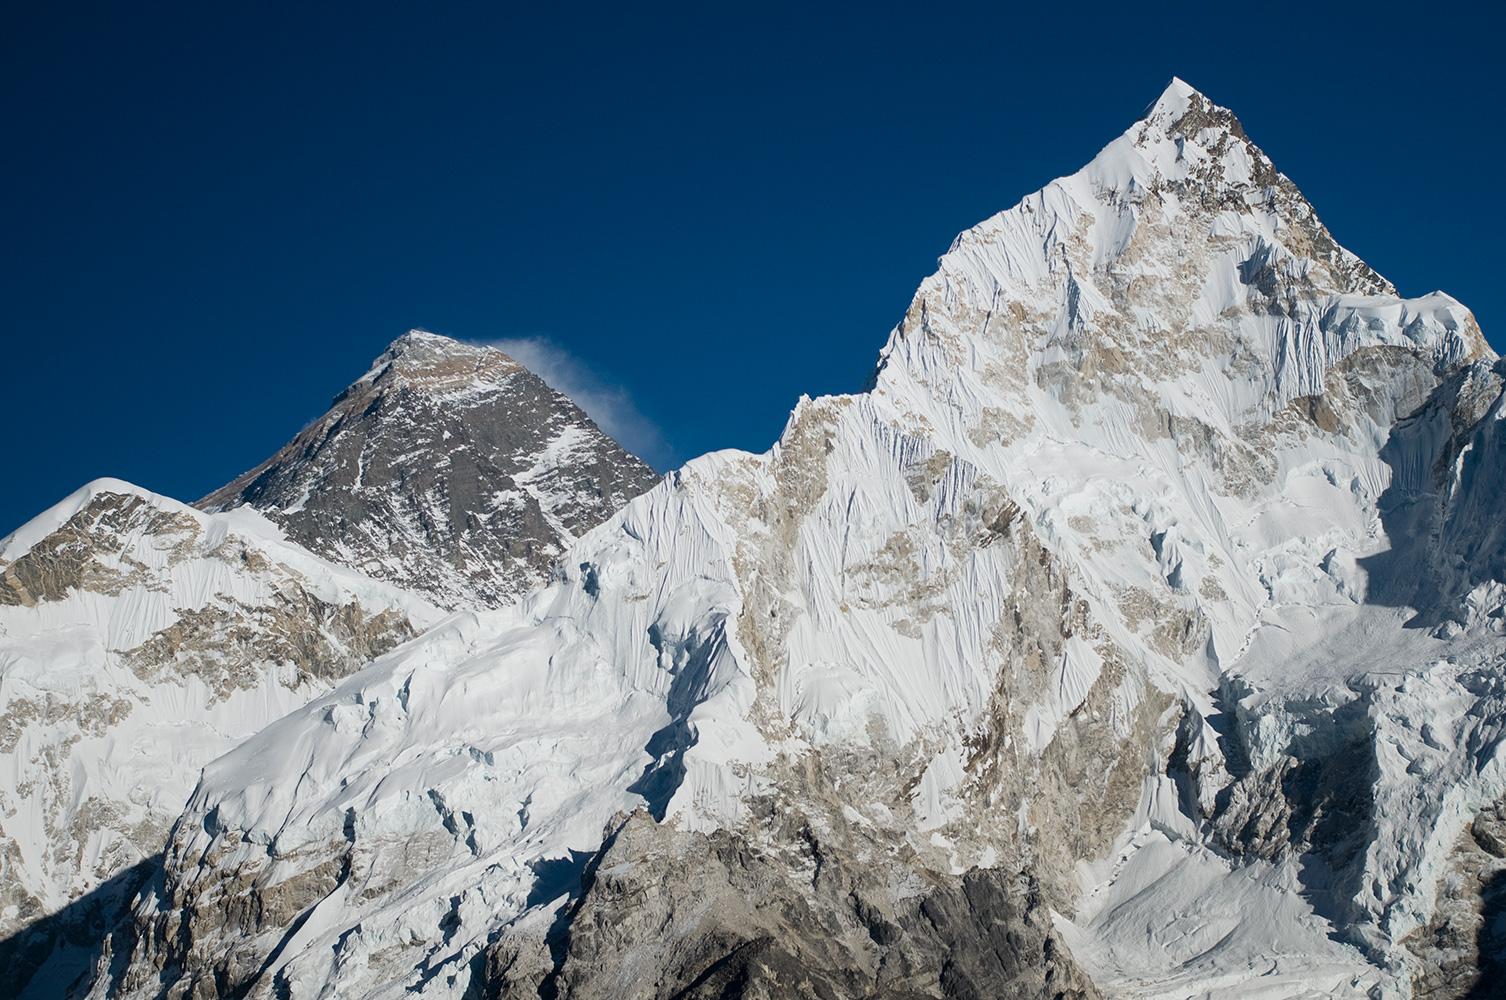 From Kala Pattar (5550m)Nikon D300, 35mm